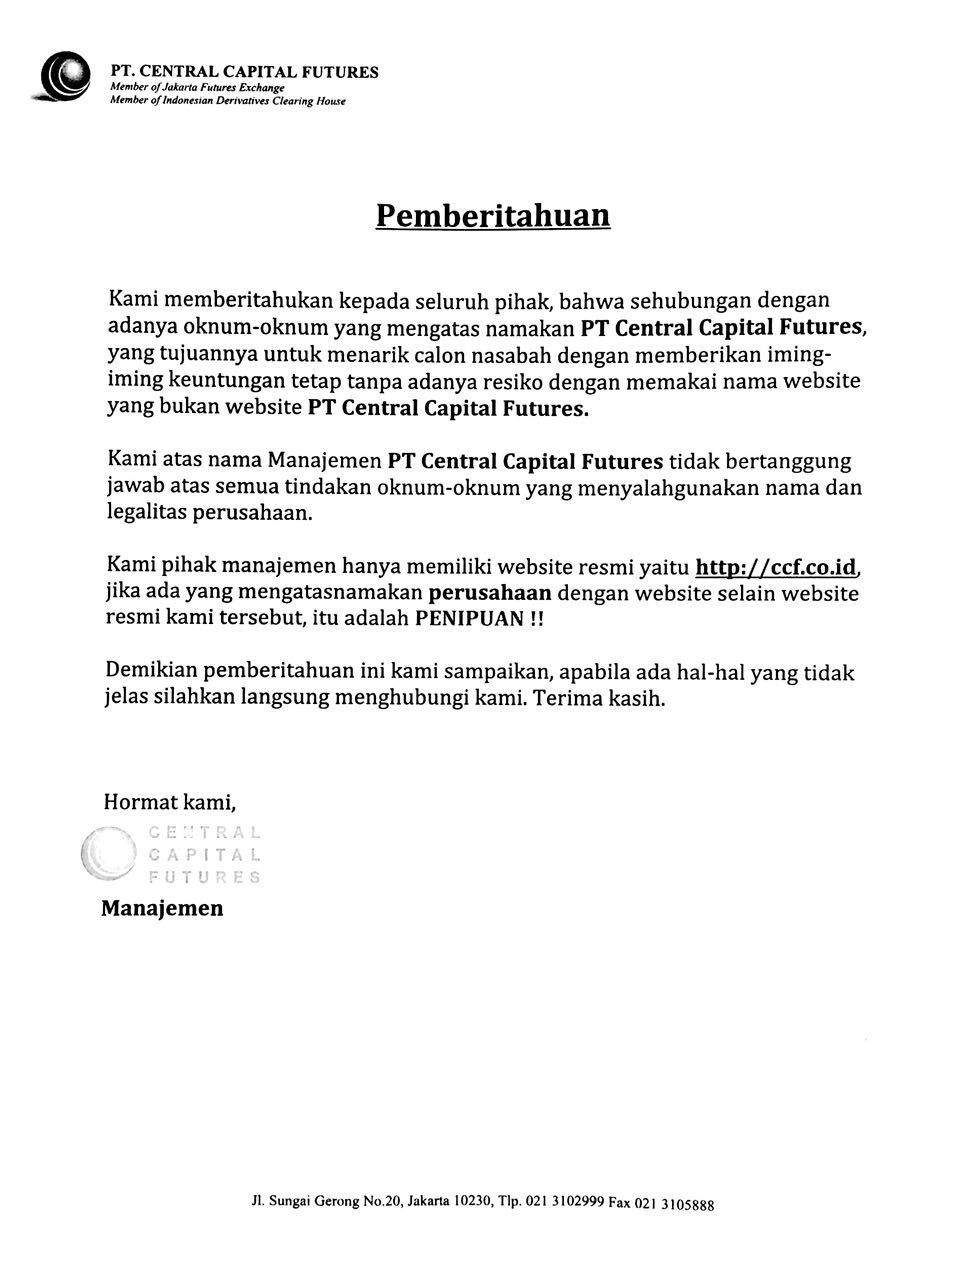 Waspada Penipuan atas nama PT Central Capital Futures | ccf